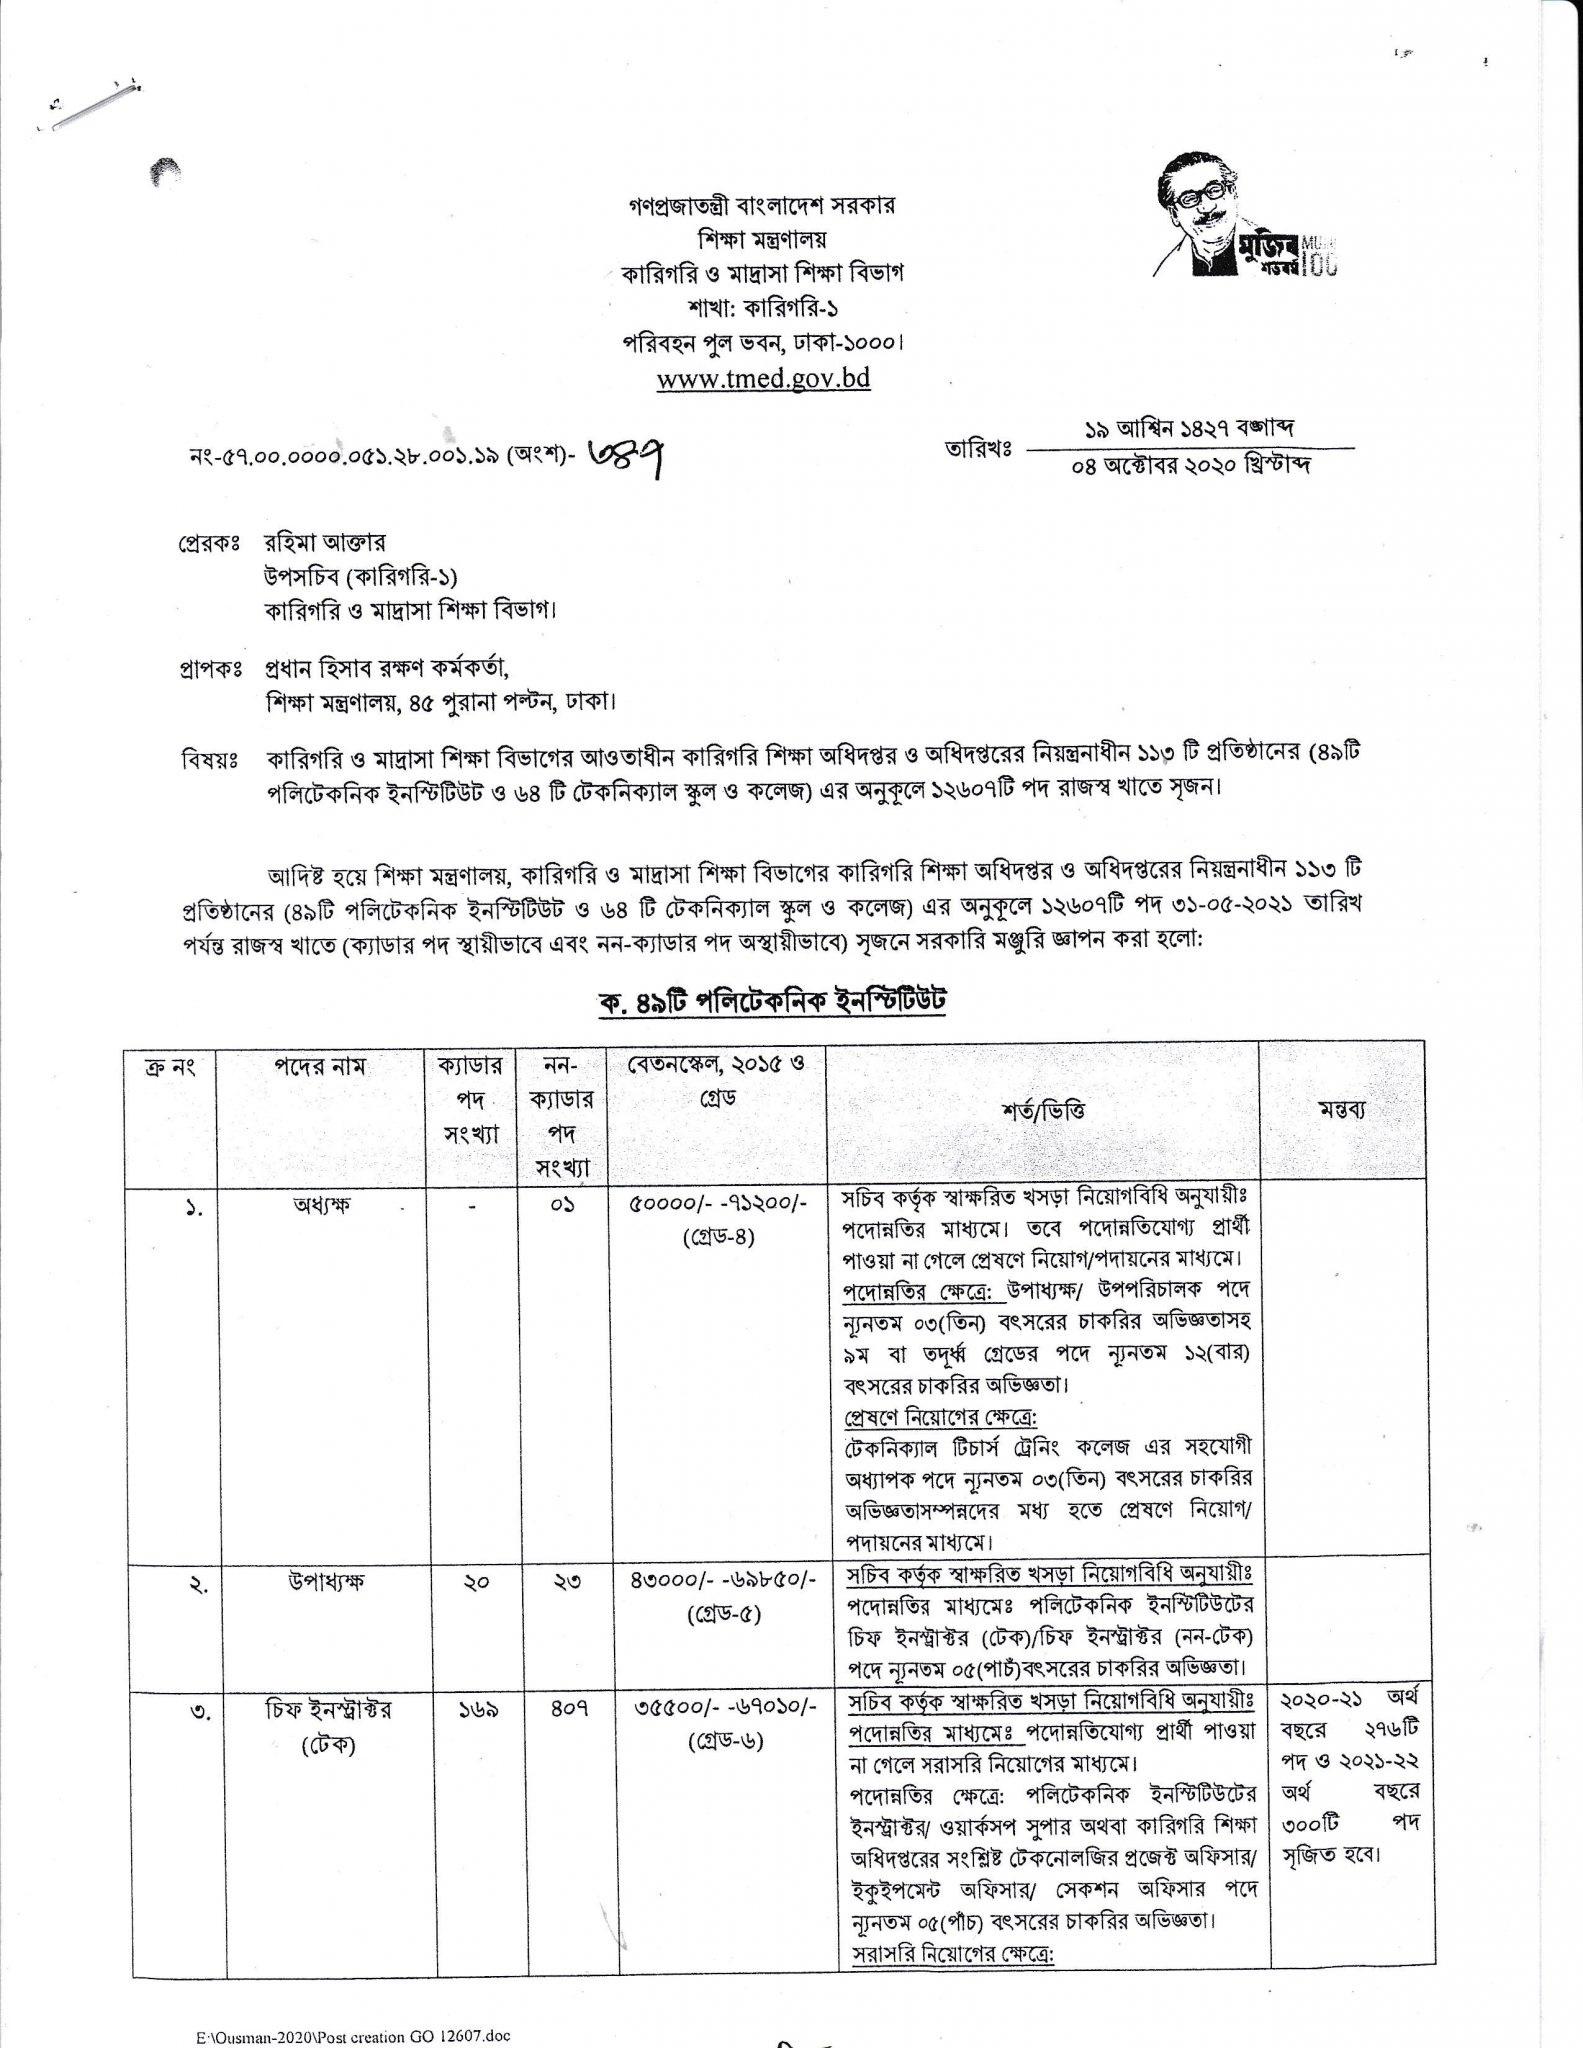 Technical and Madrasah Education TMED Job Circular 2020